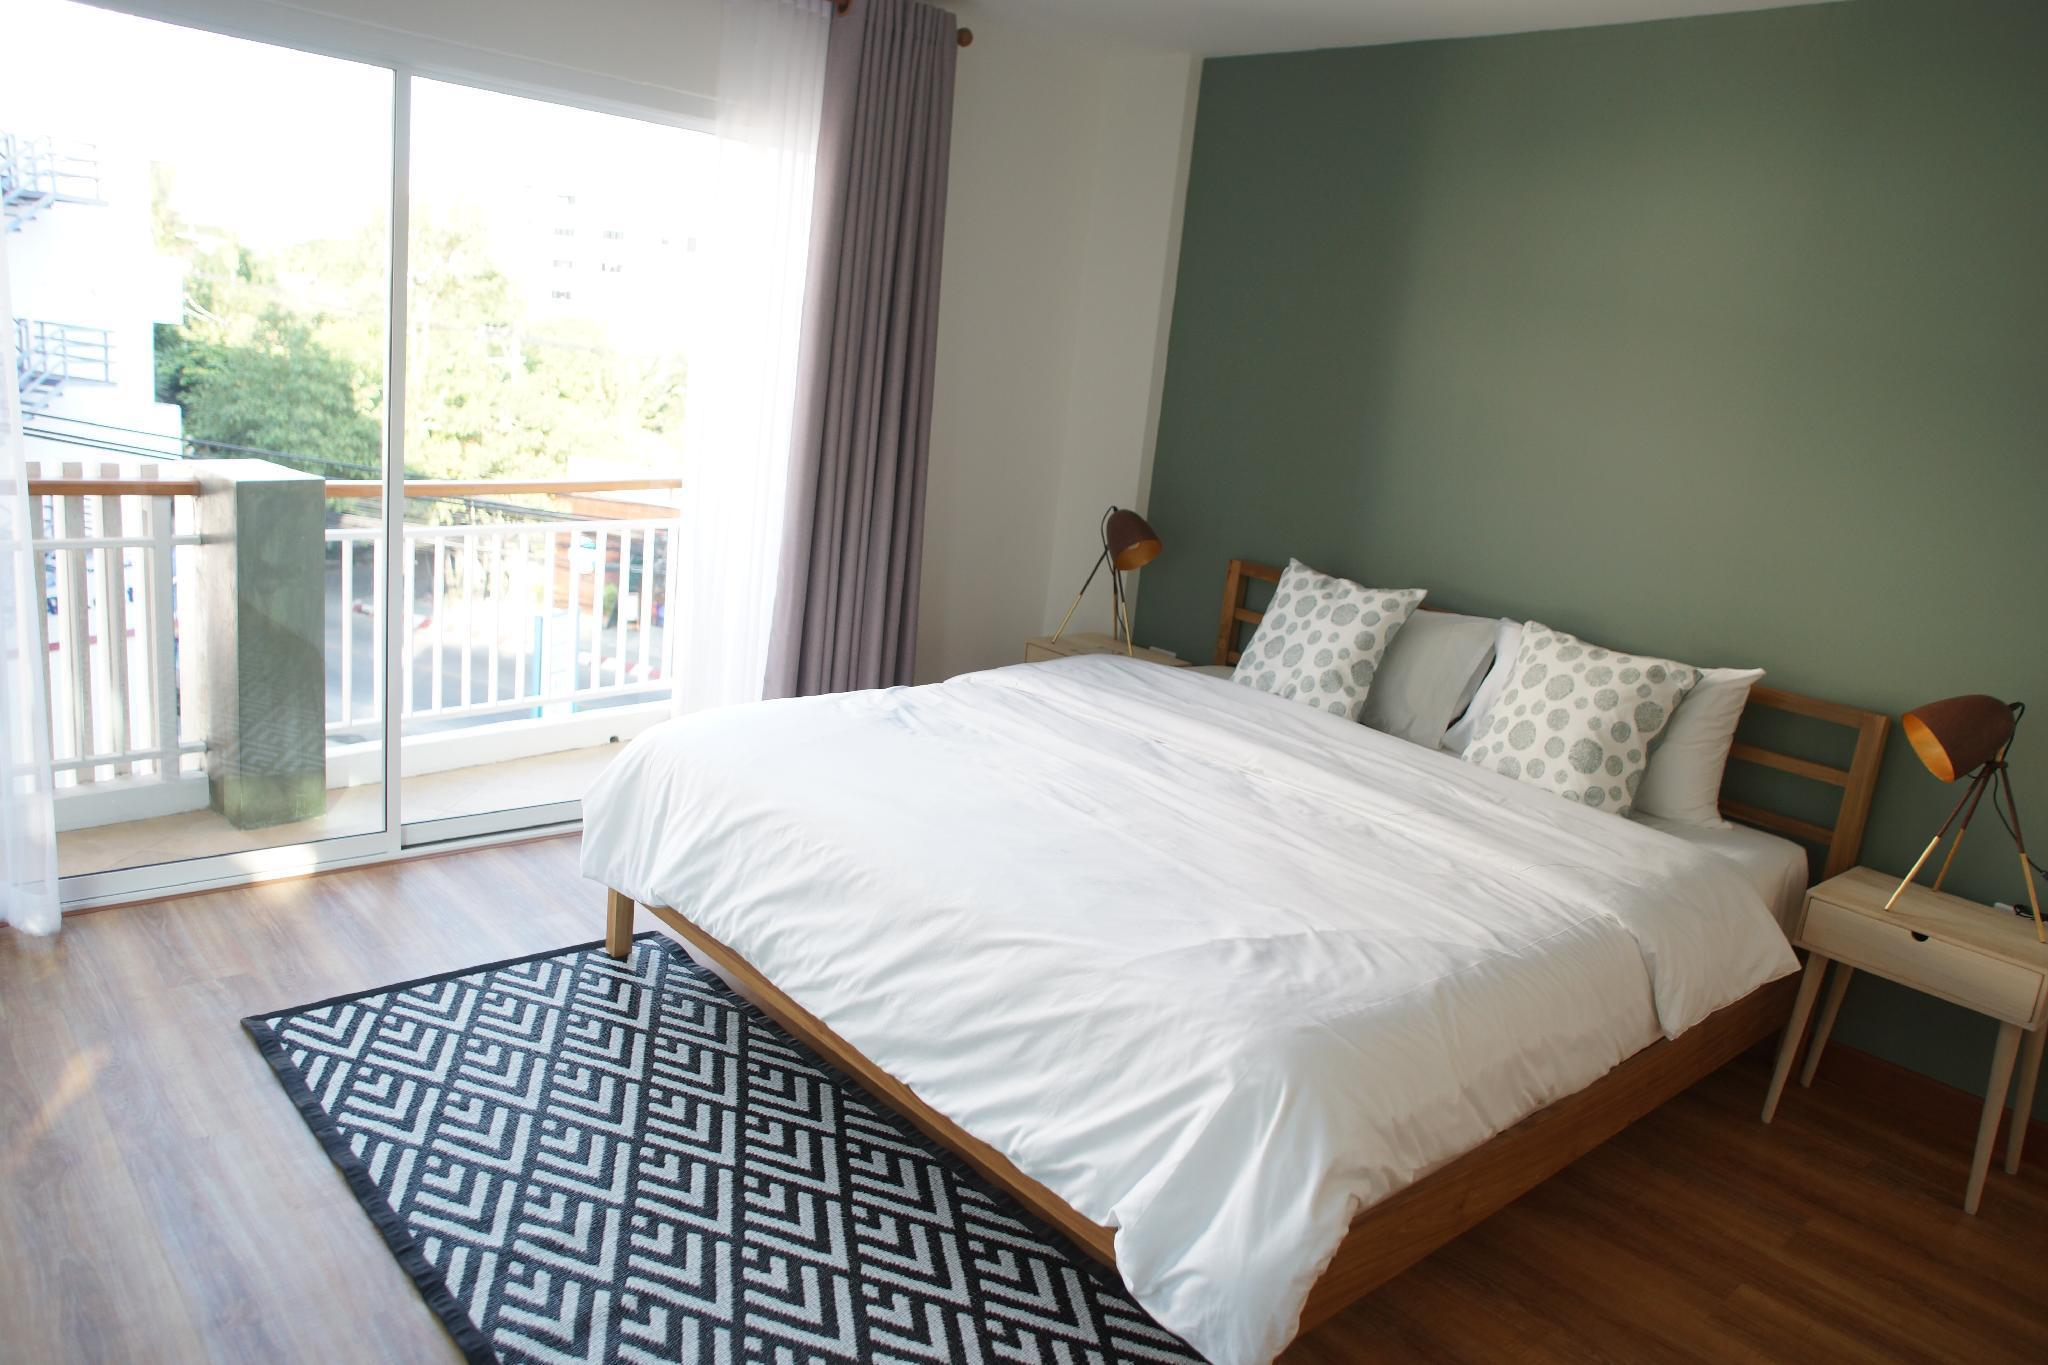 Breadfruit / Deluxe Room อพาร์ตเมนต์ 1 ห้องนอน 1 ห้องน้ำส่วนตัว ขนาด 25 ตร.ม. – นิมมานเหมินทร์